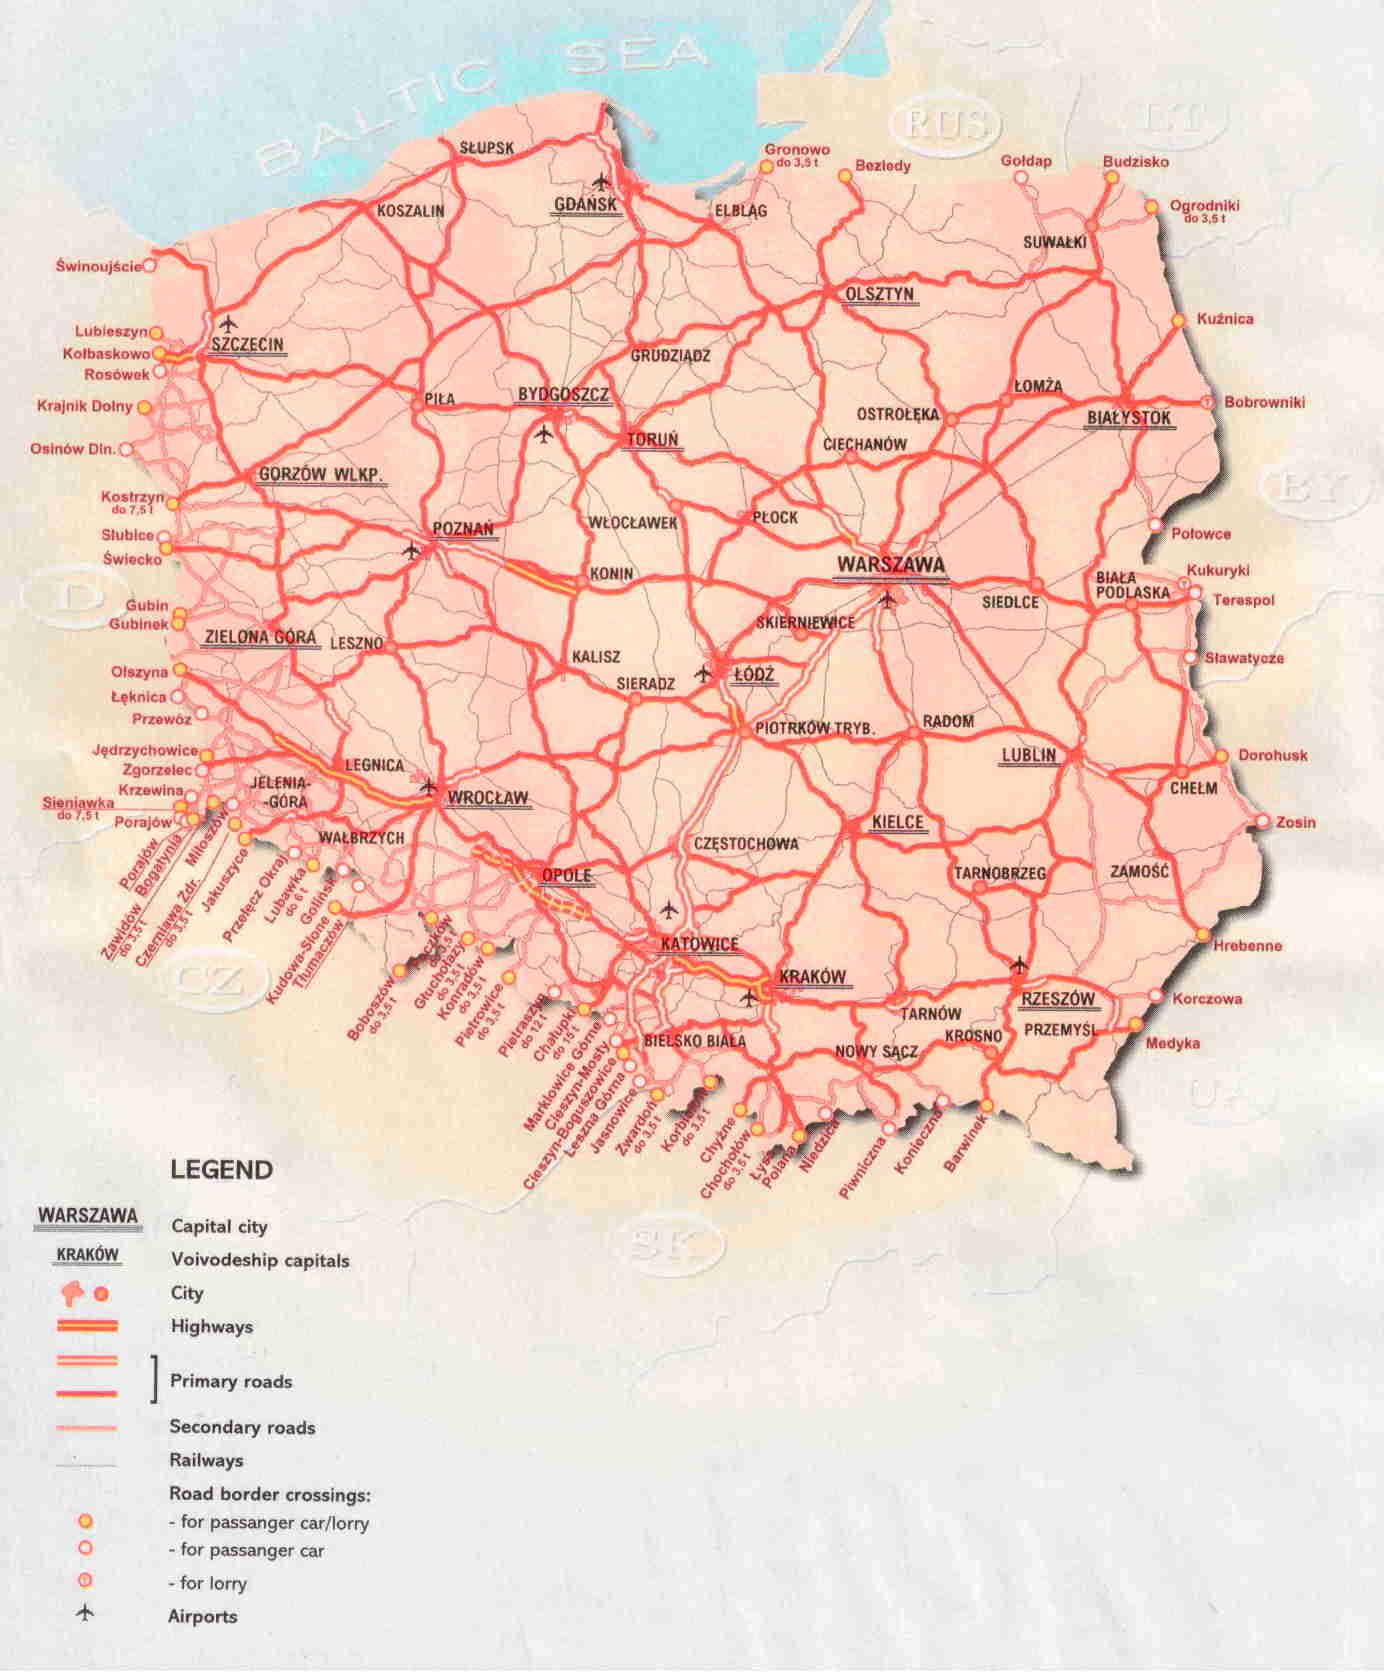 Карта автодорог Польши: http://polandru.narod.ru/transport/map_way.html